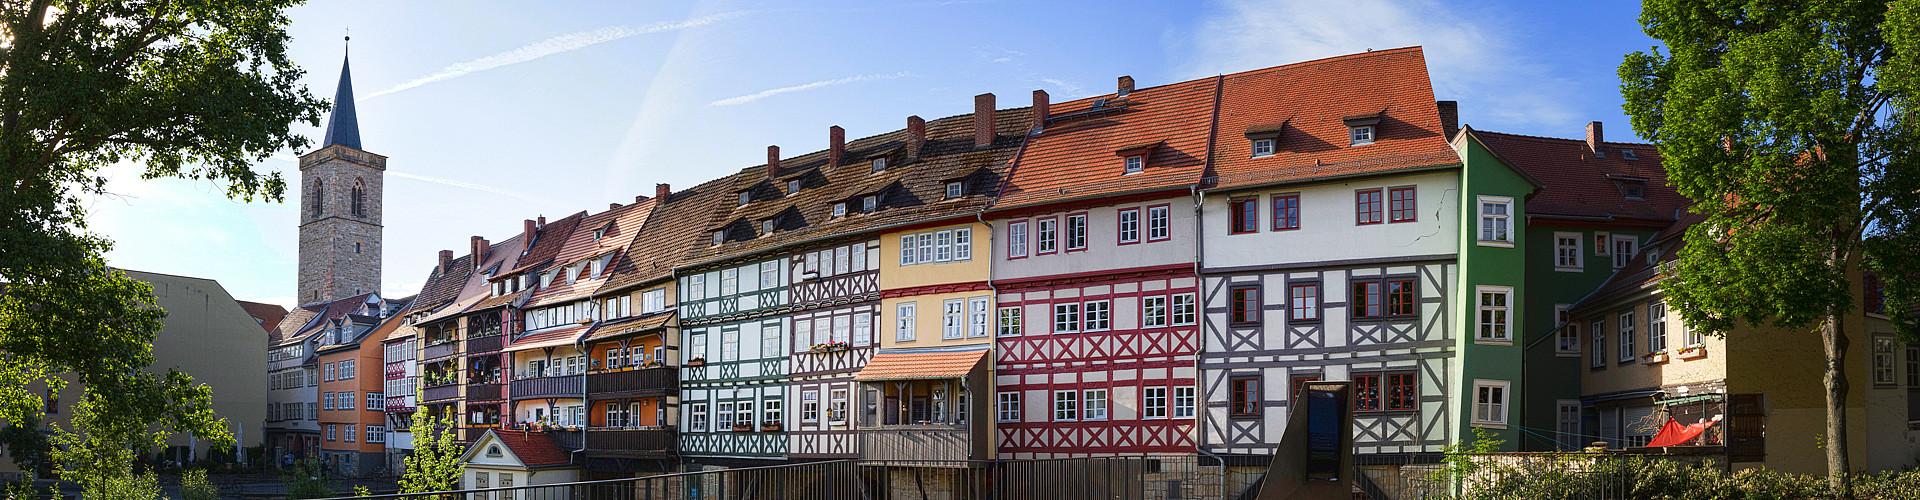 Blick auf die Krämerbrücke in Erfurt.